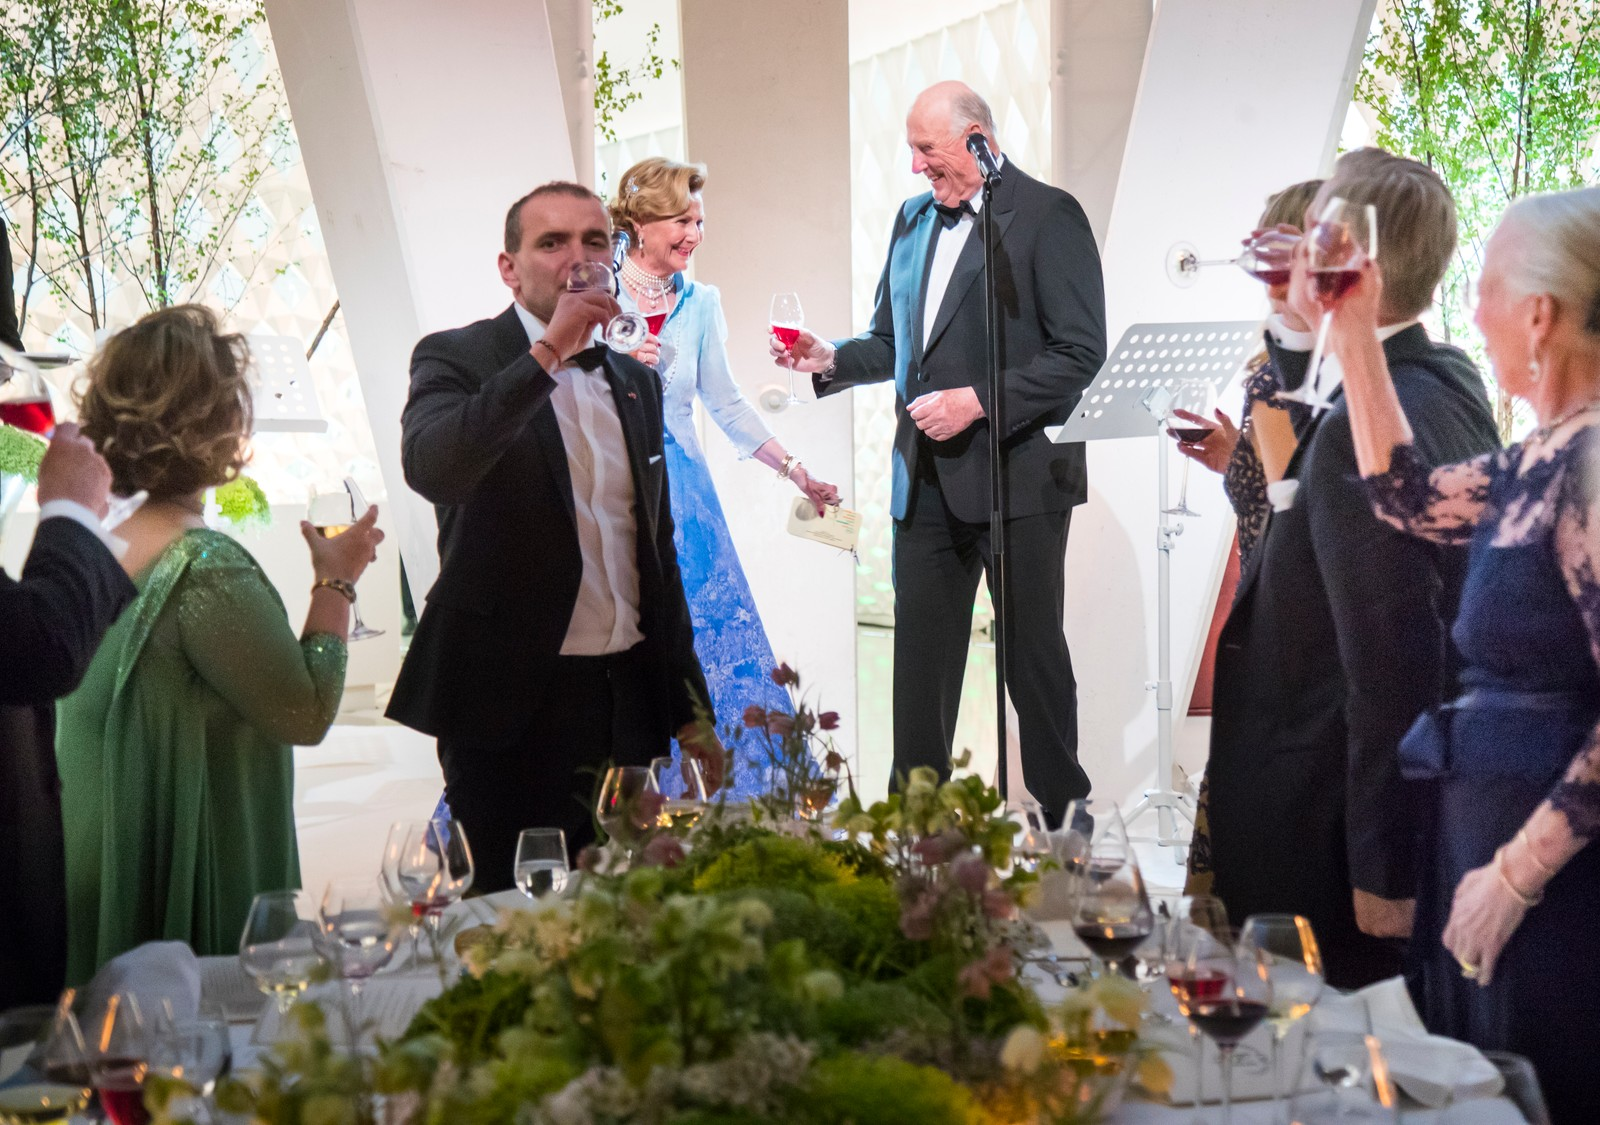 Dronning Sonja og kong Harald skåler under regjeringens festmiddag for kongeparet i Operaen i anledning deres 80-årsfeiring.